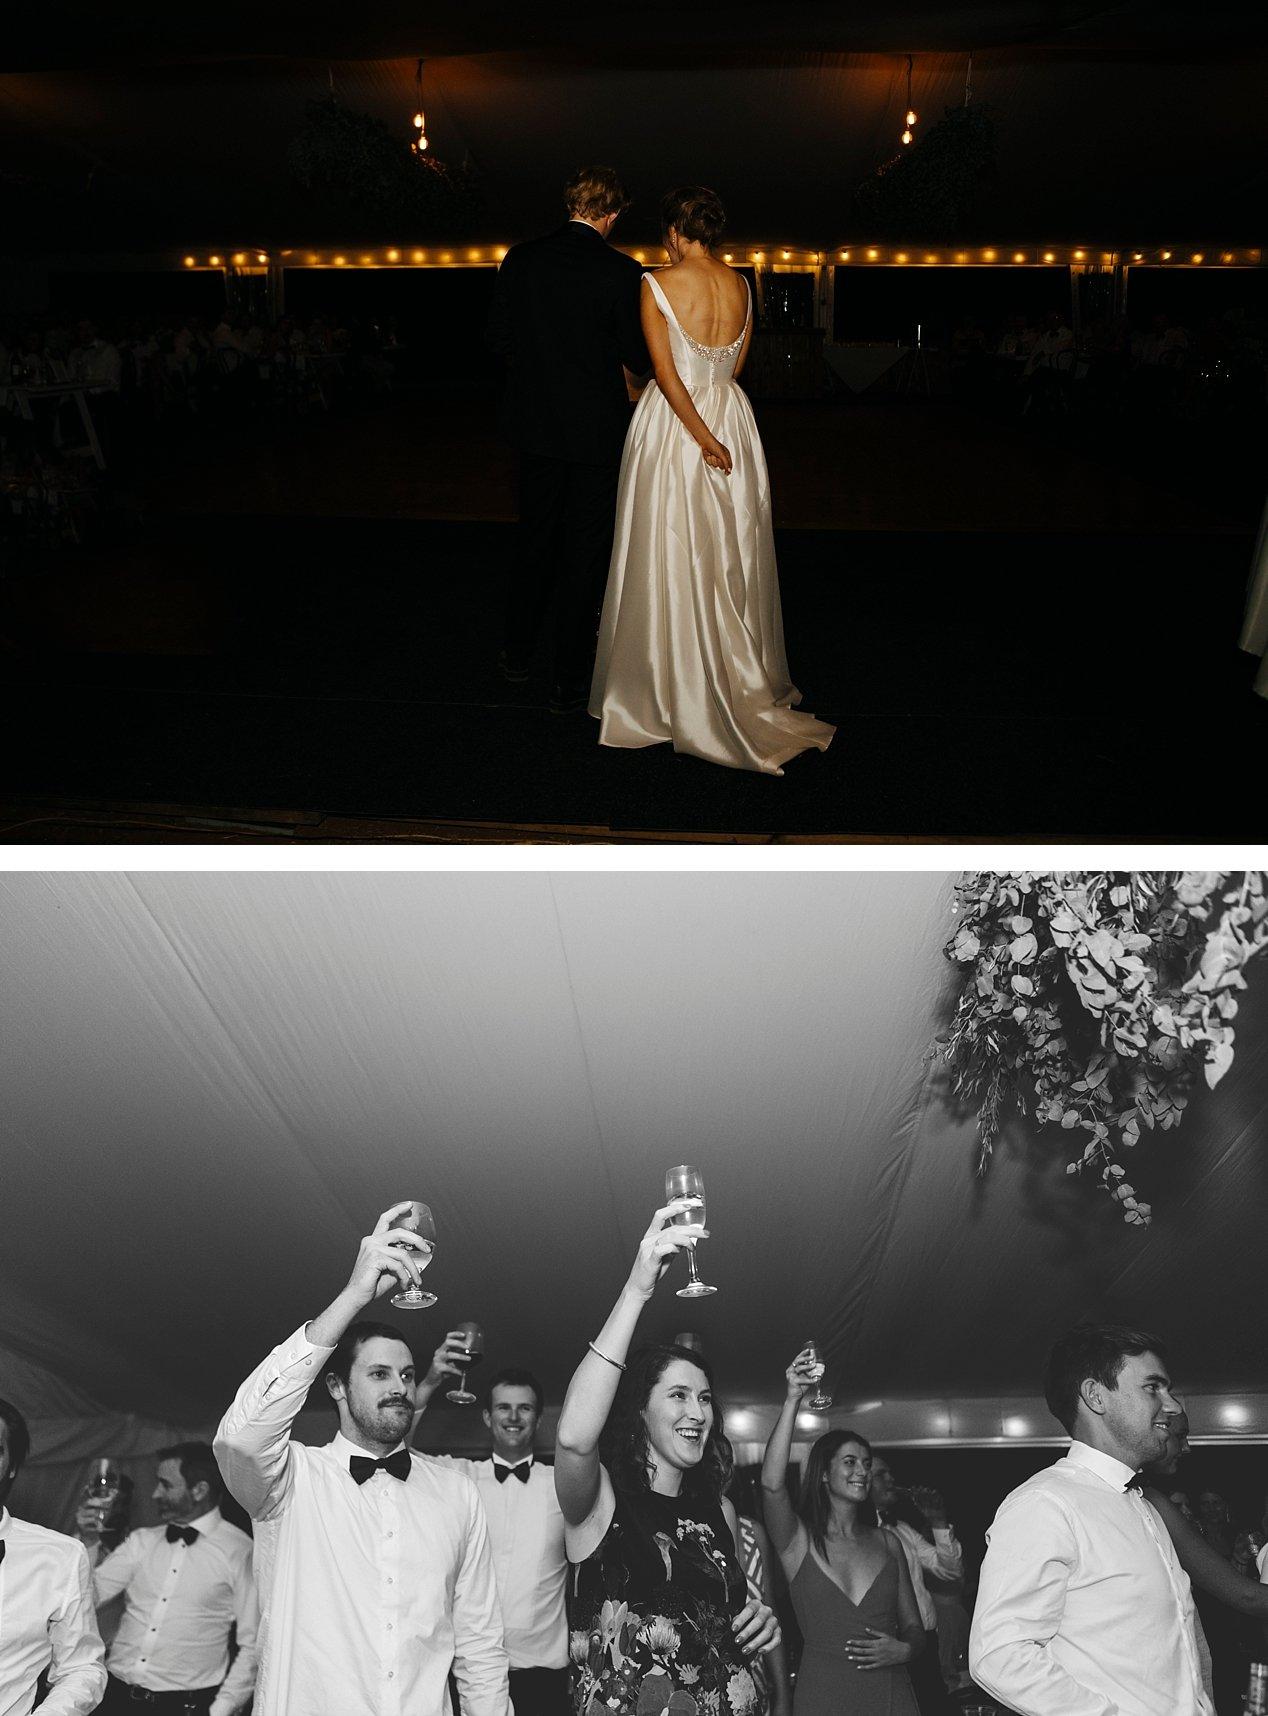 Deniliquin Jerilderie Wagga Wagga Wedding Photographer_The Crossing Deniliquin party caterers Deniliquin1